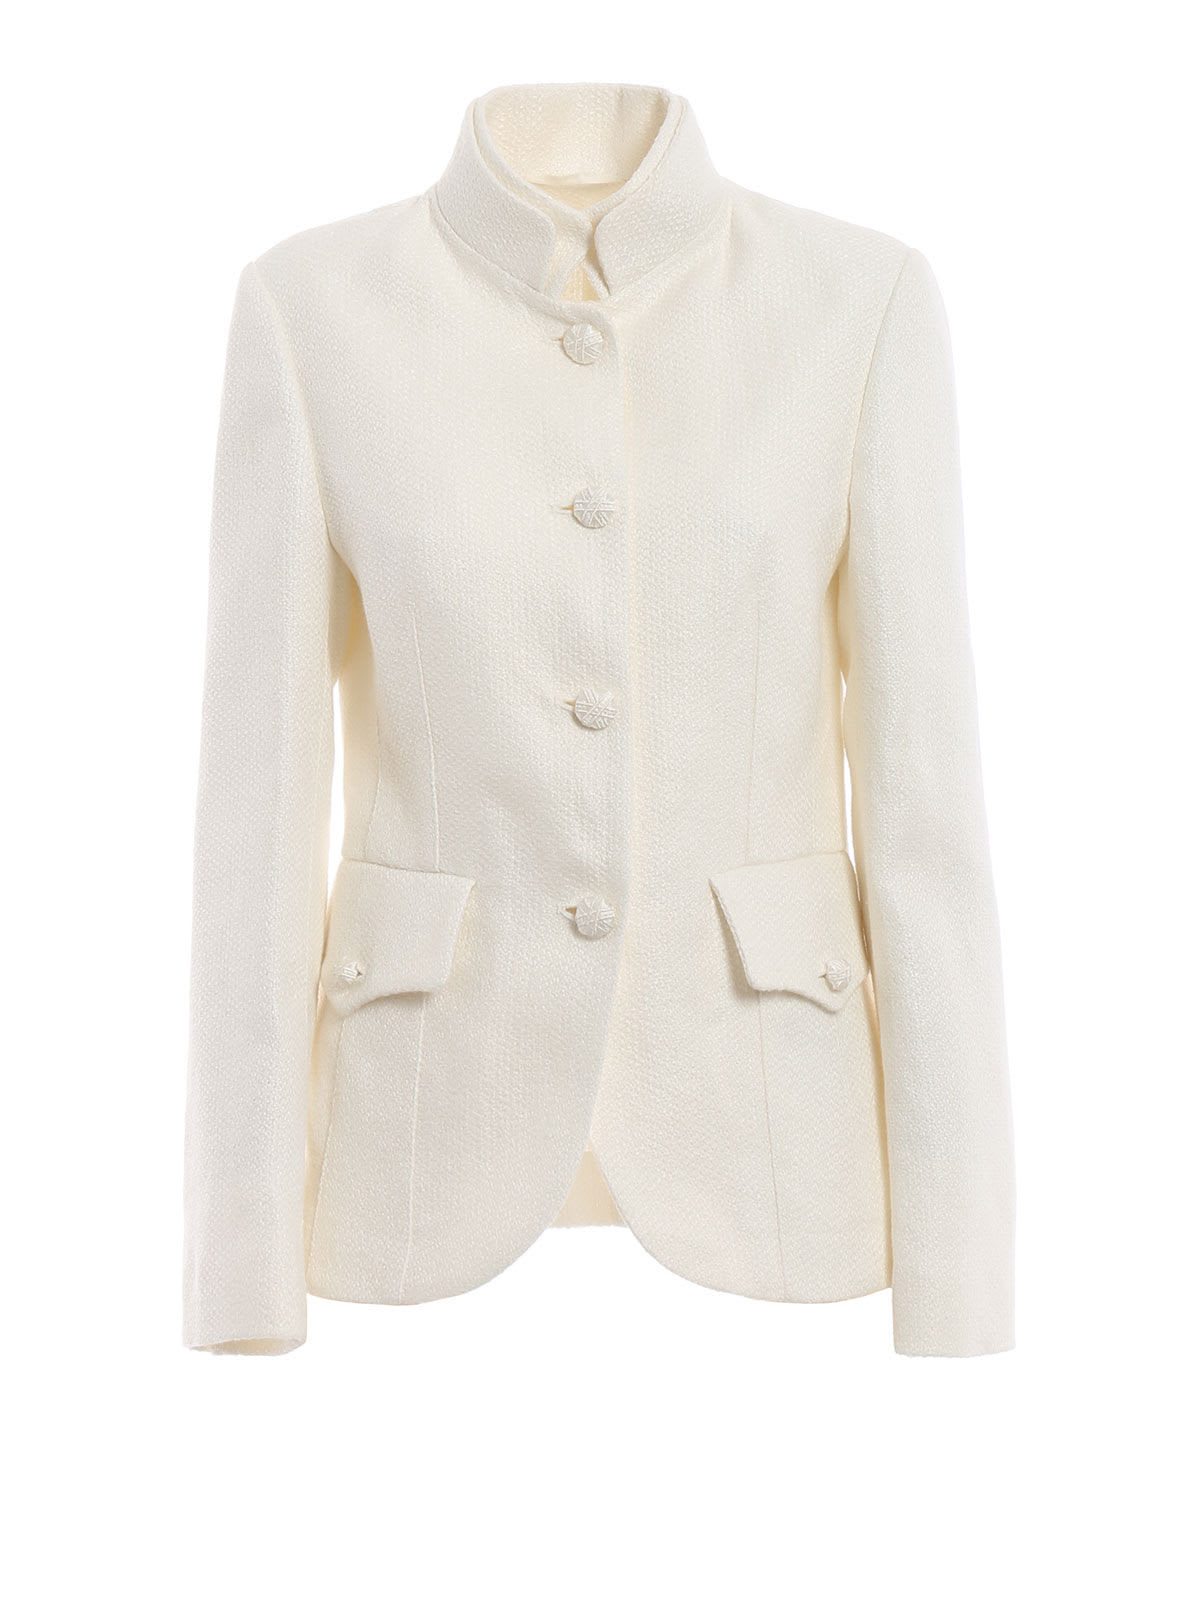 Ermanno Scervino Stand-up Collar Jacket